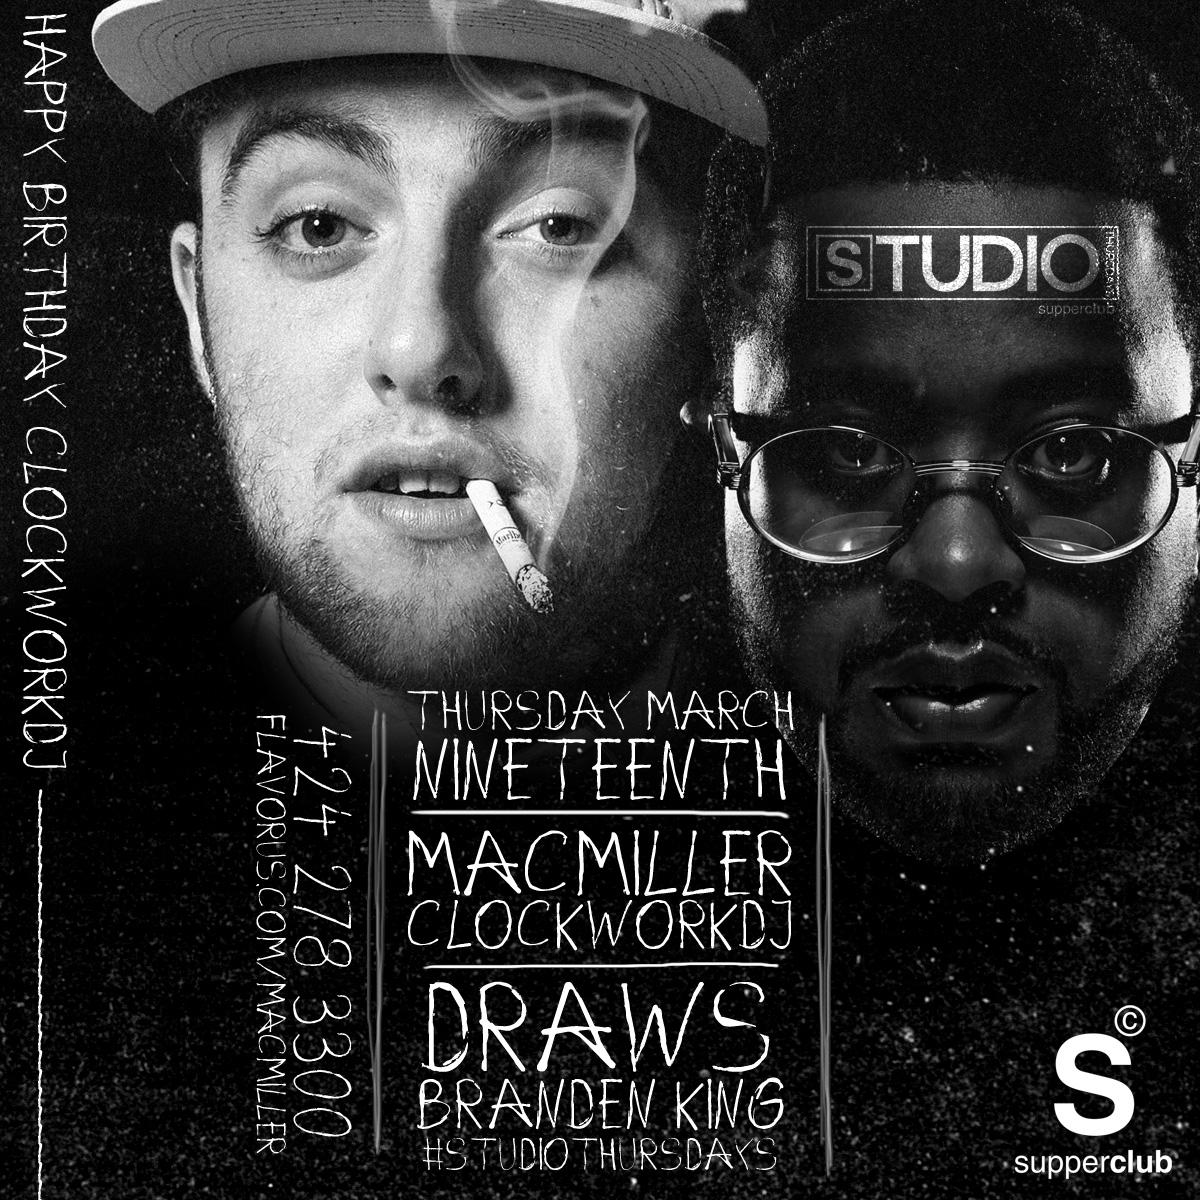 Mac Miller + ClockworkDJ live at Supperclub Tickets 03/19/15